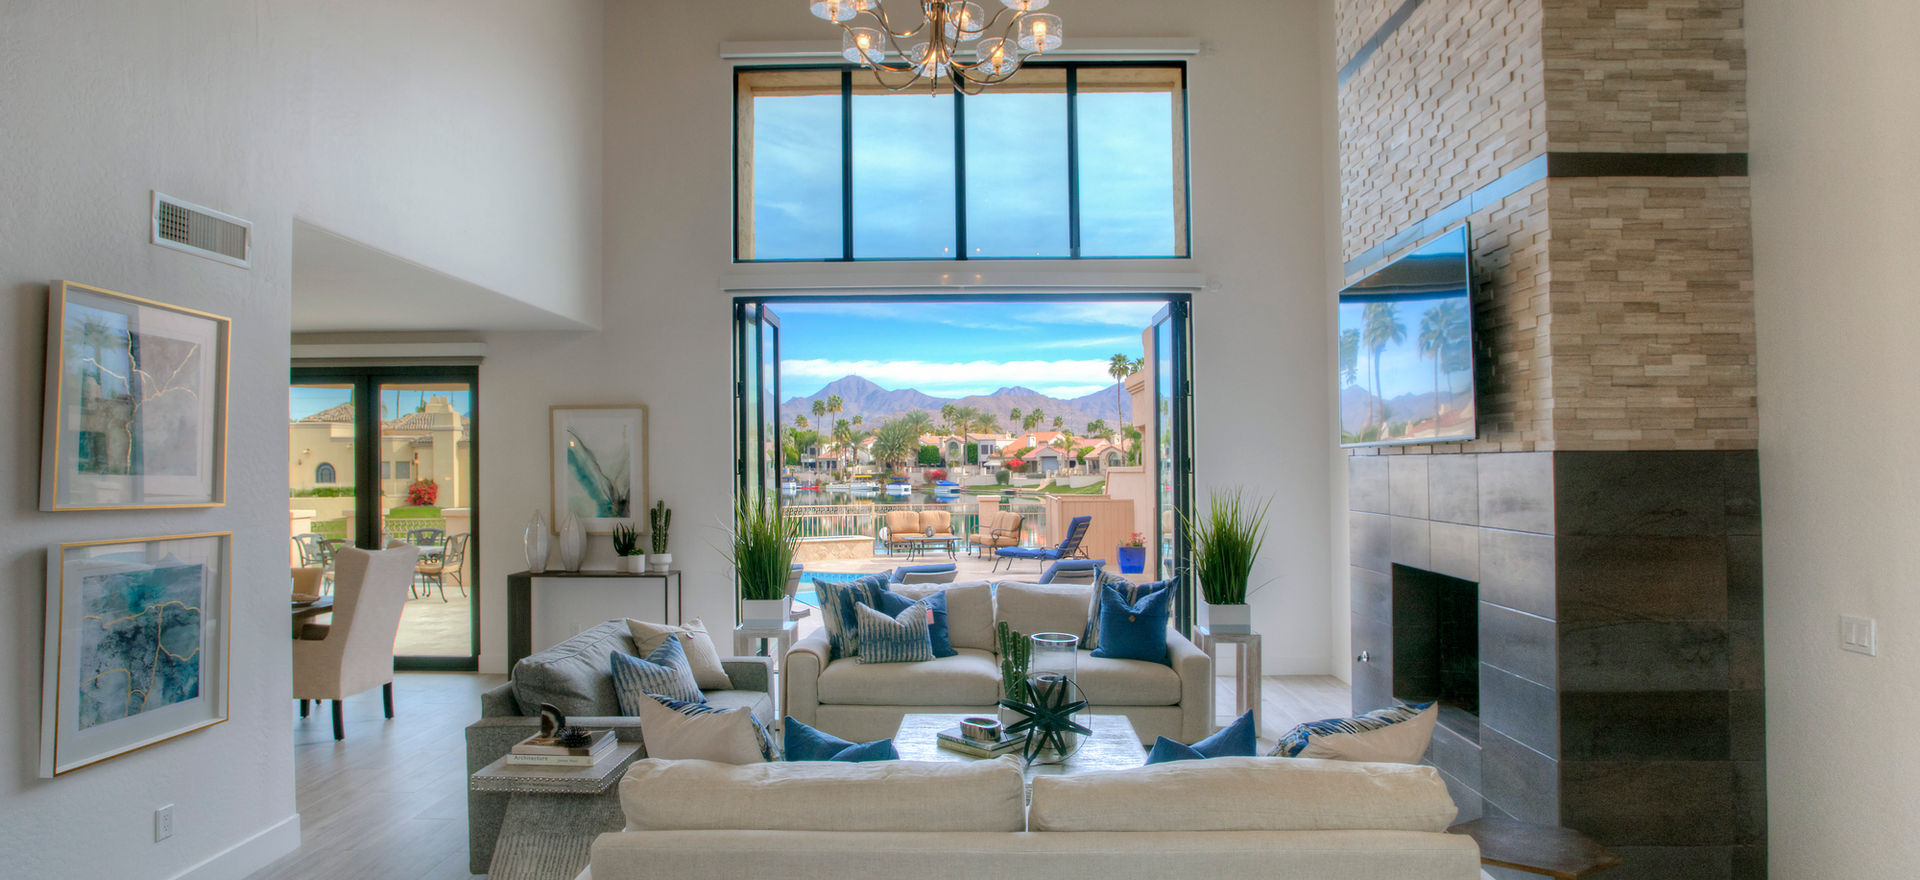 SCOTTSDALE RANCH WHOLE HOUSE RENOVATION